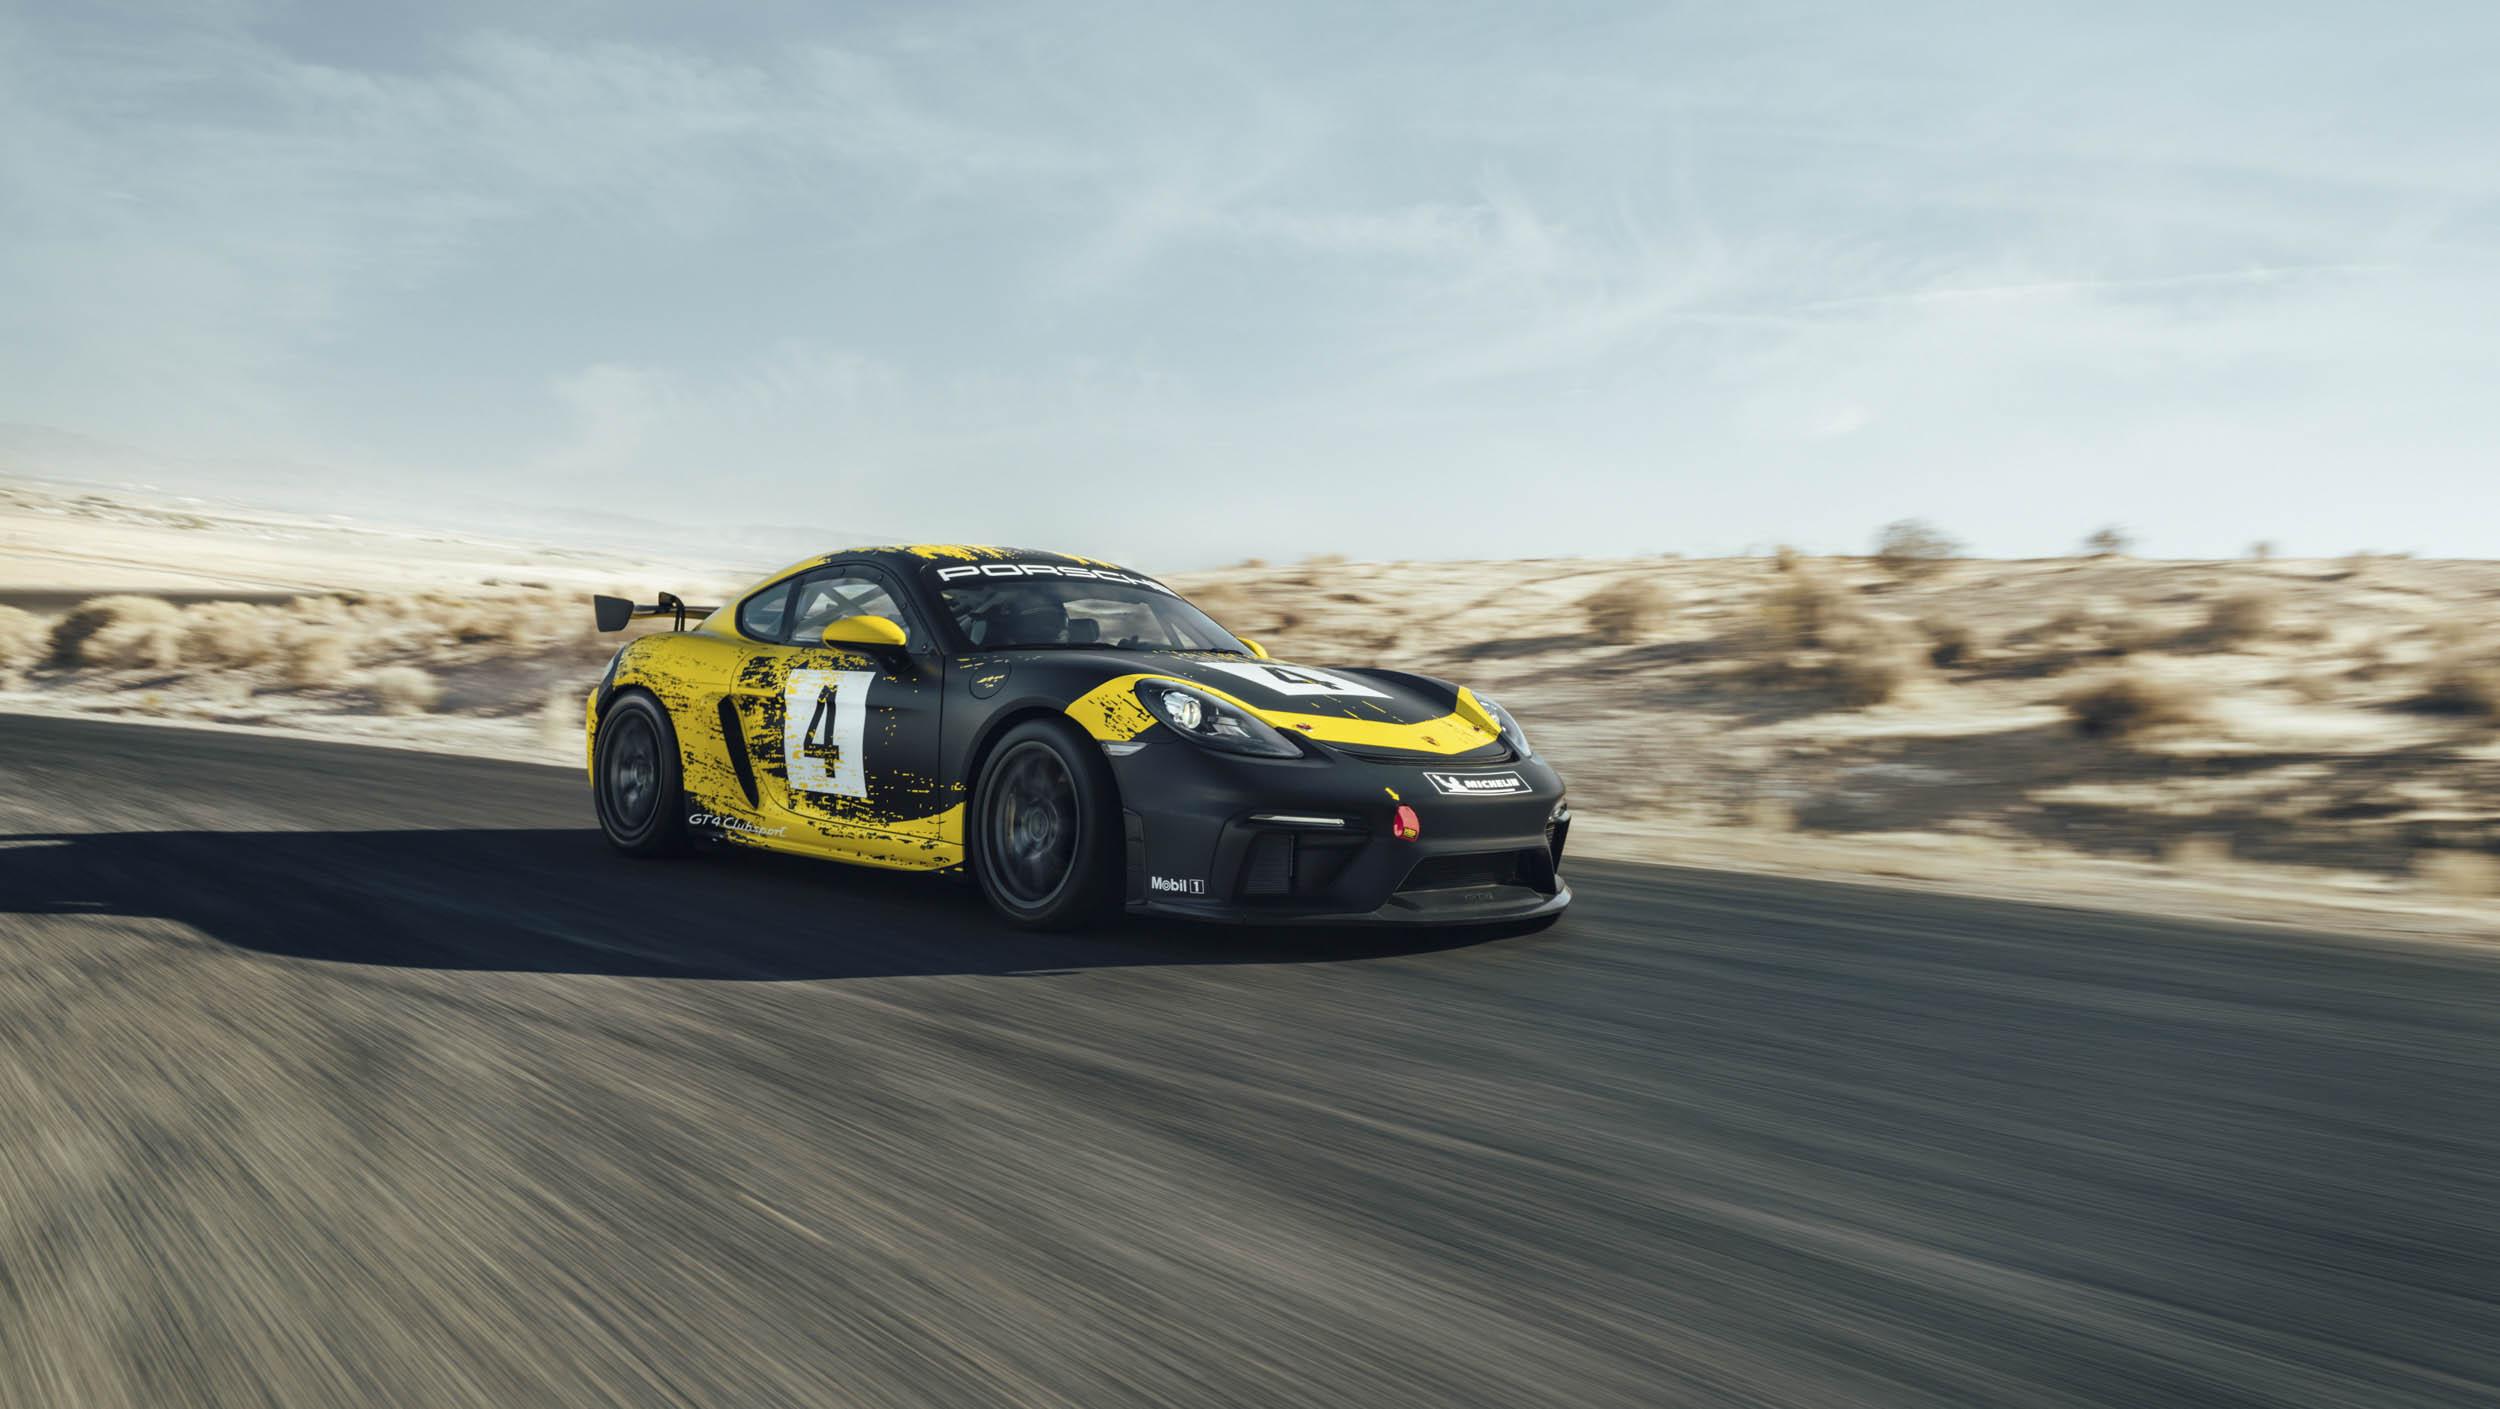 2019 Porsche 718 Cayman GT4 Clubsport on the track